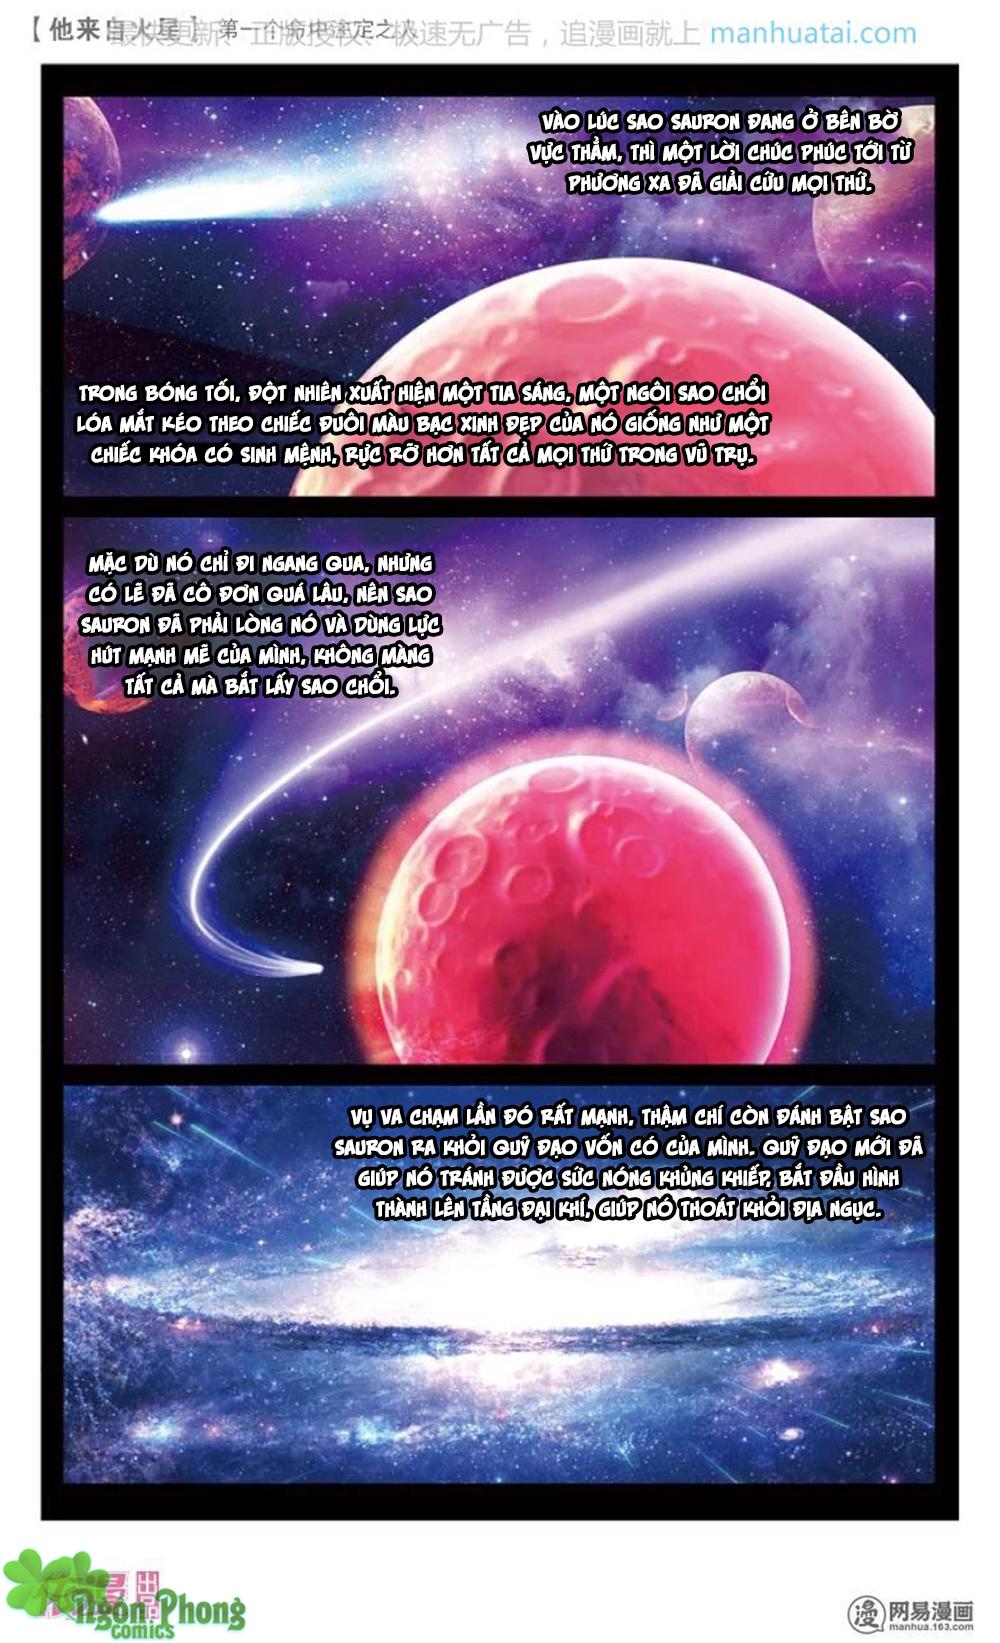 Hắn Đến Từ Sao Hỏa Chap 14 - Next Chap 15